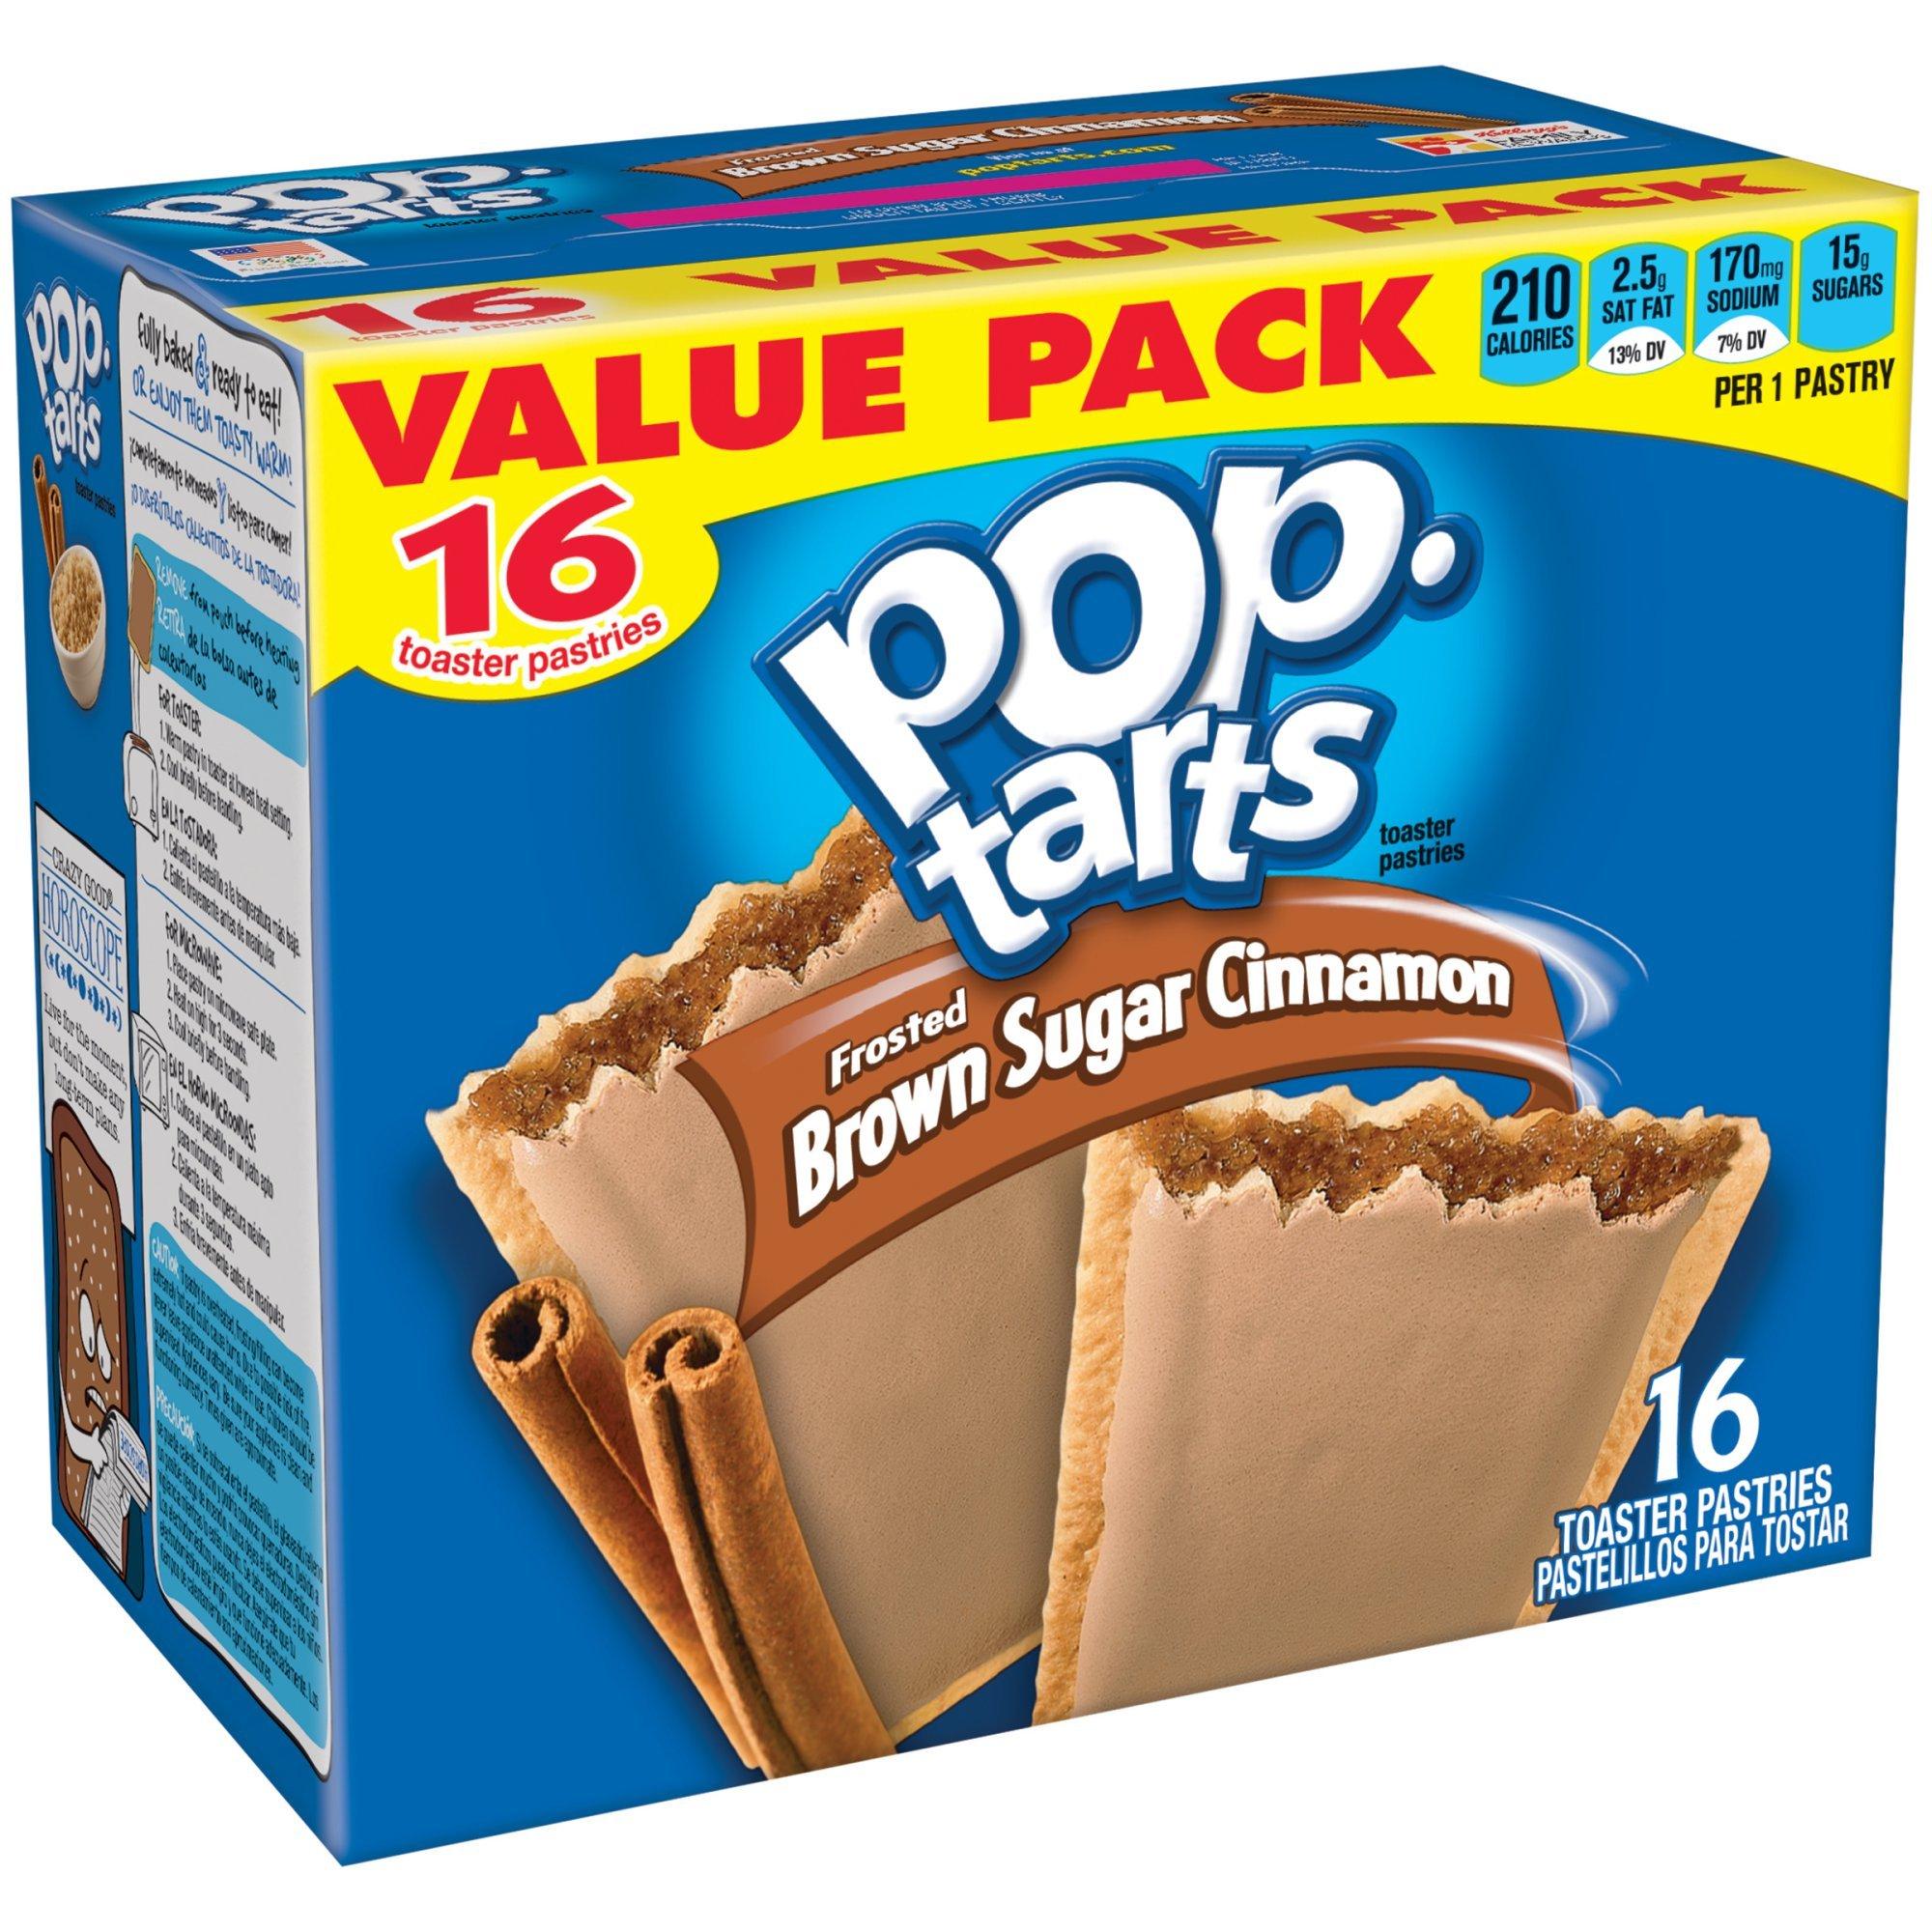 Kellogg's Brown Sugar Cinnamon Pop-Tarts Toaster Pastries, 16 ct